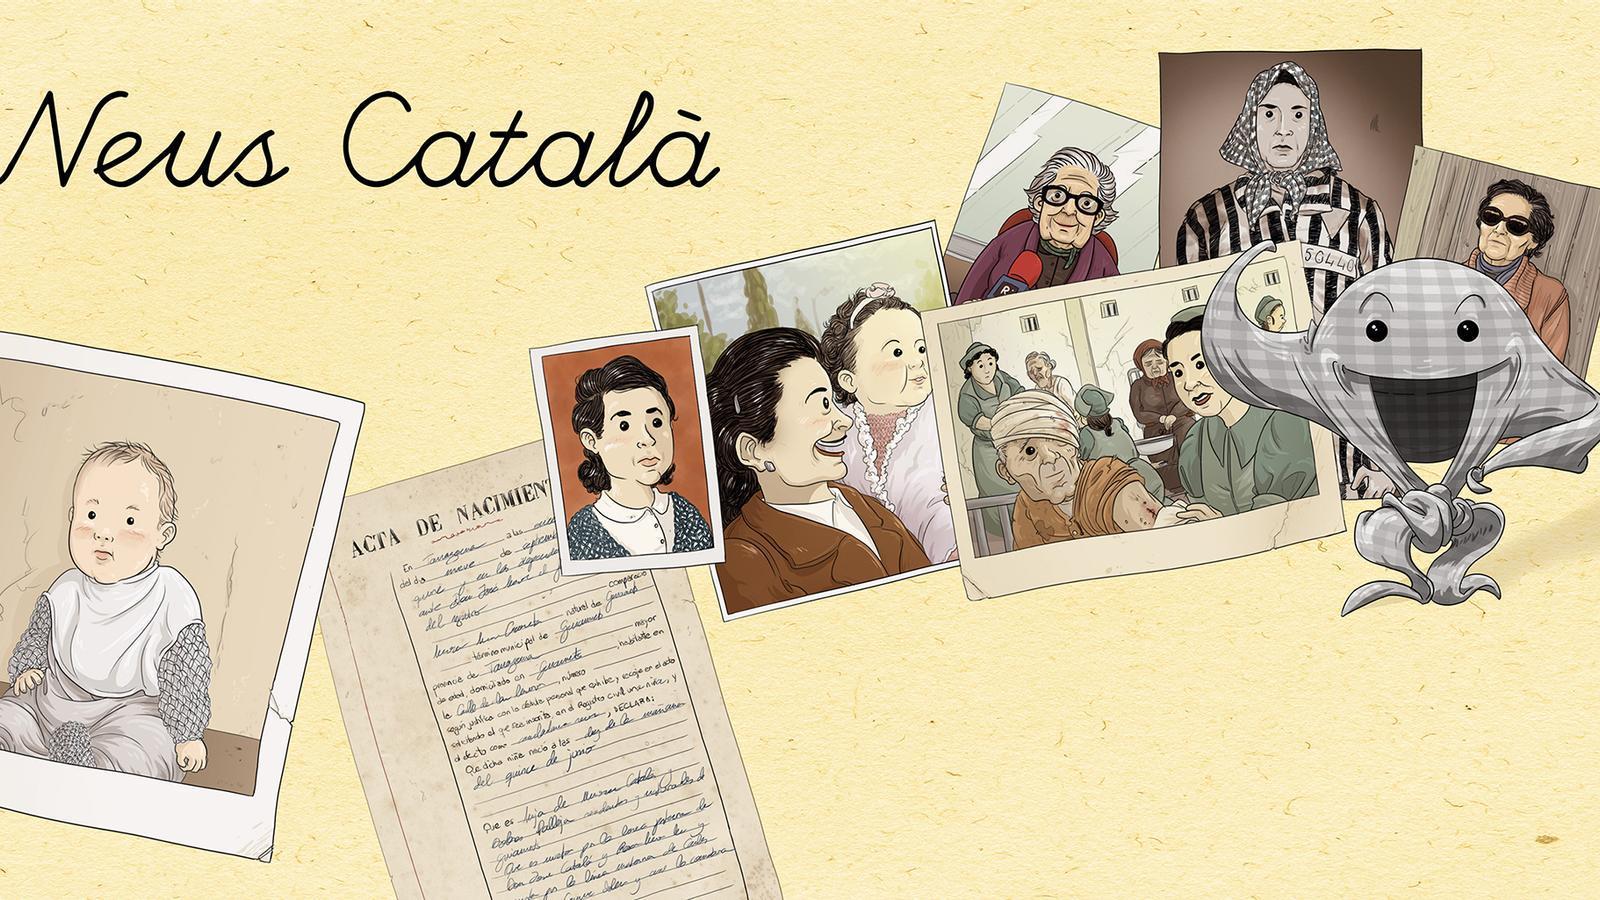 La biografia de Neus Català